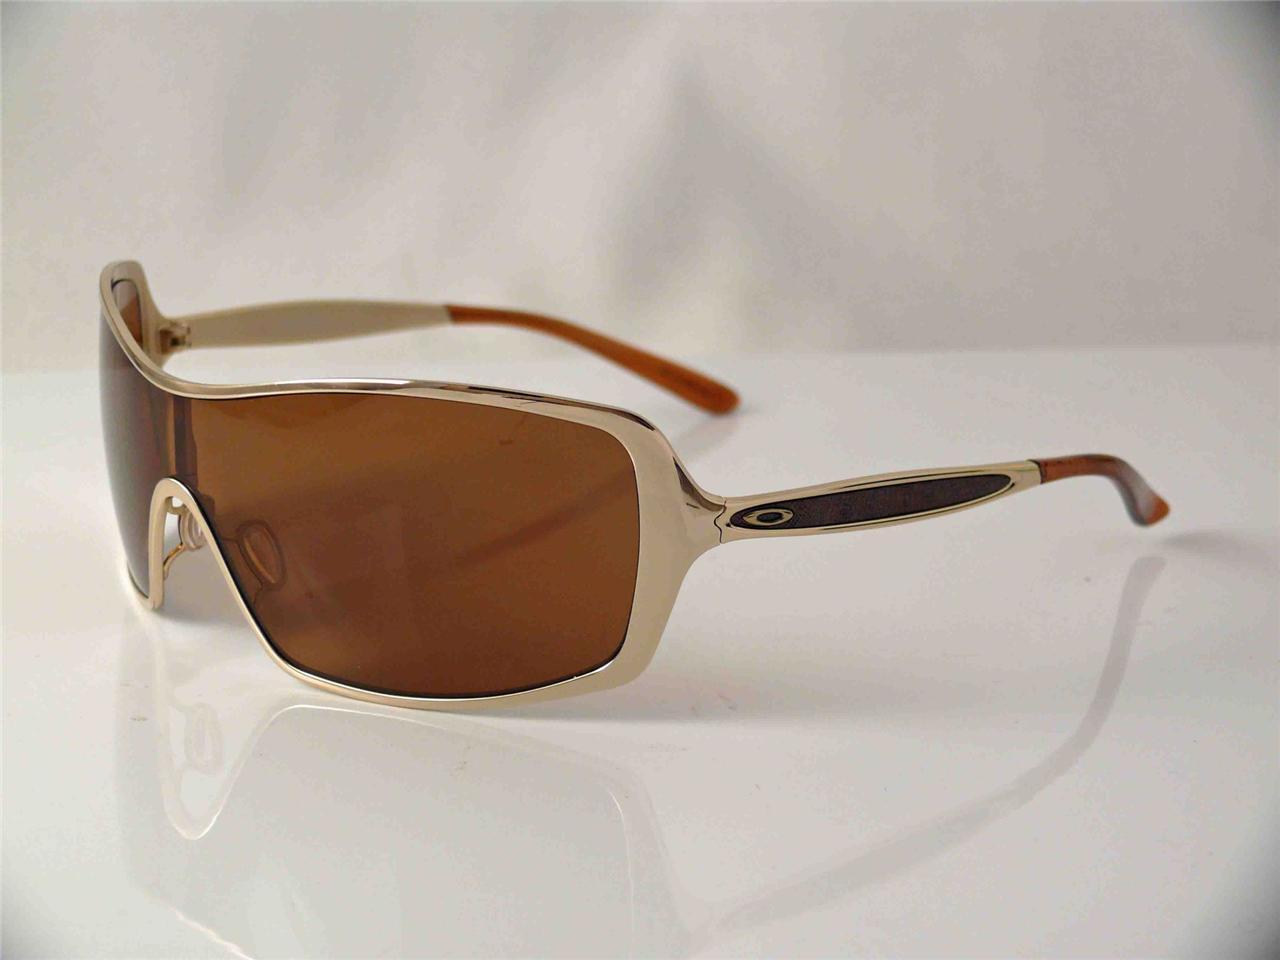 223c7b5325 Oakley Sunglasses Gold Frames « Heritage Malta